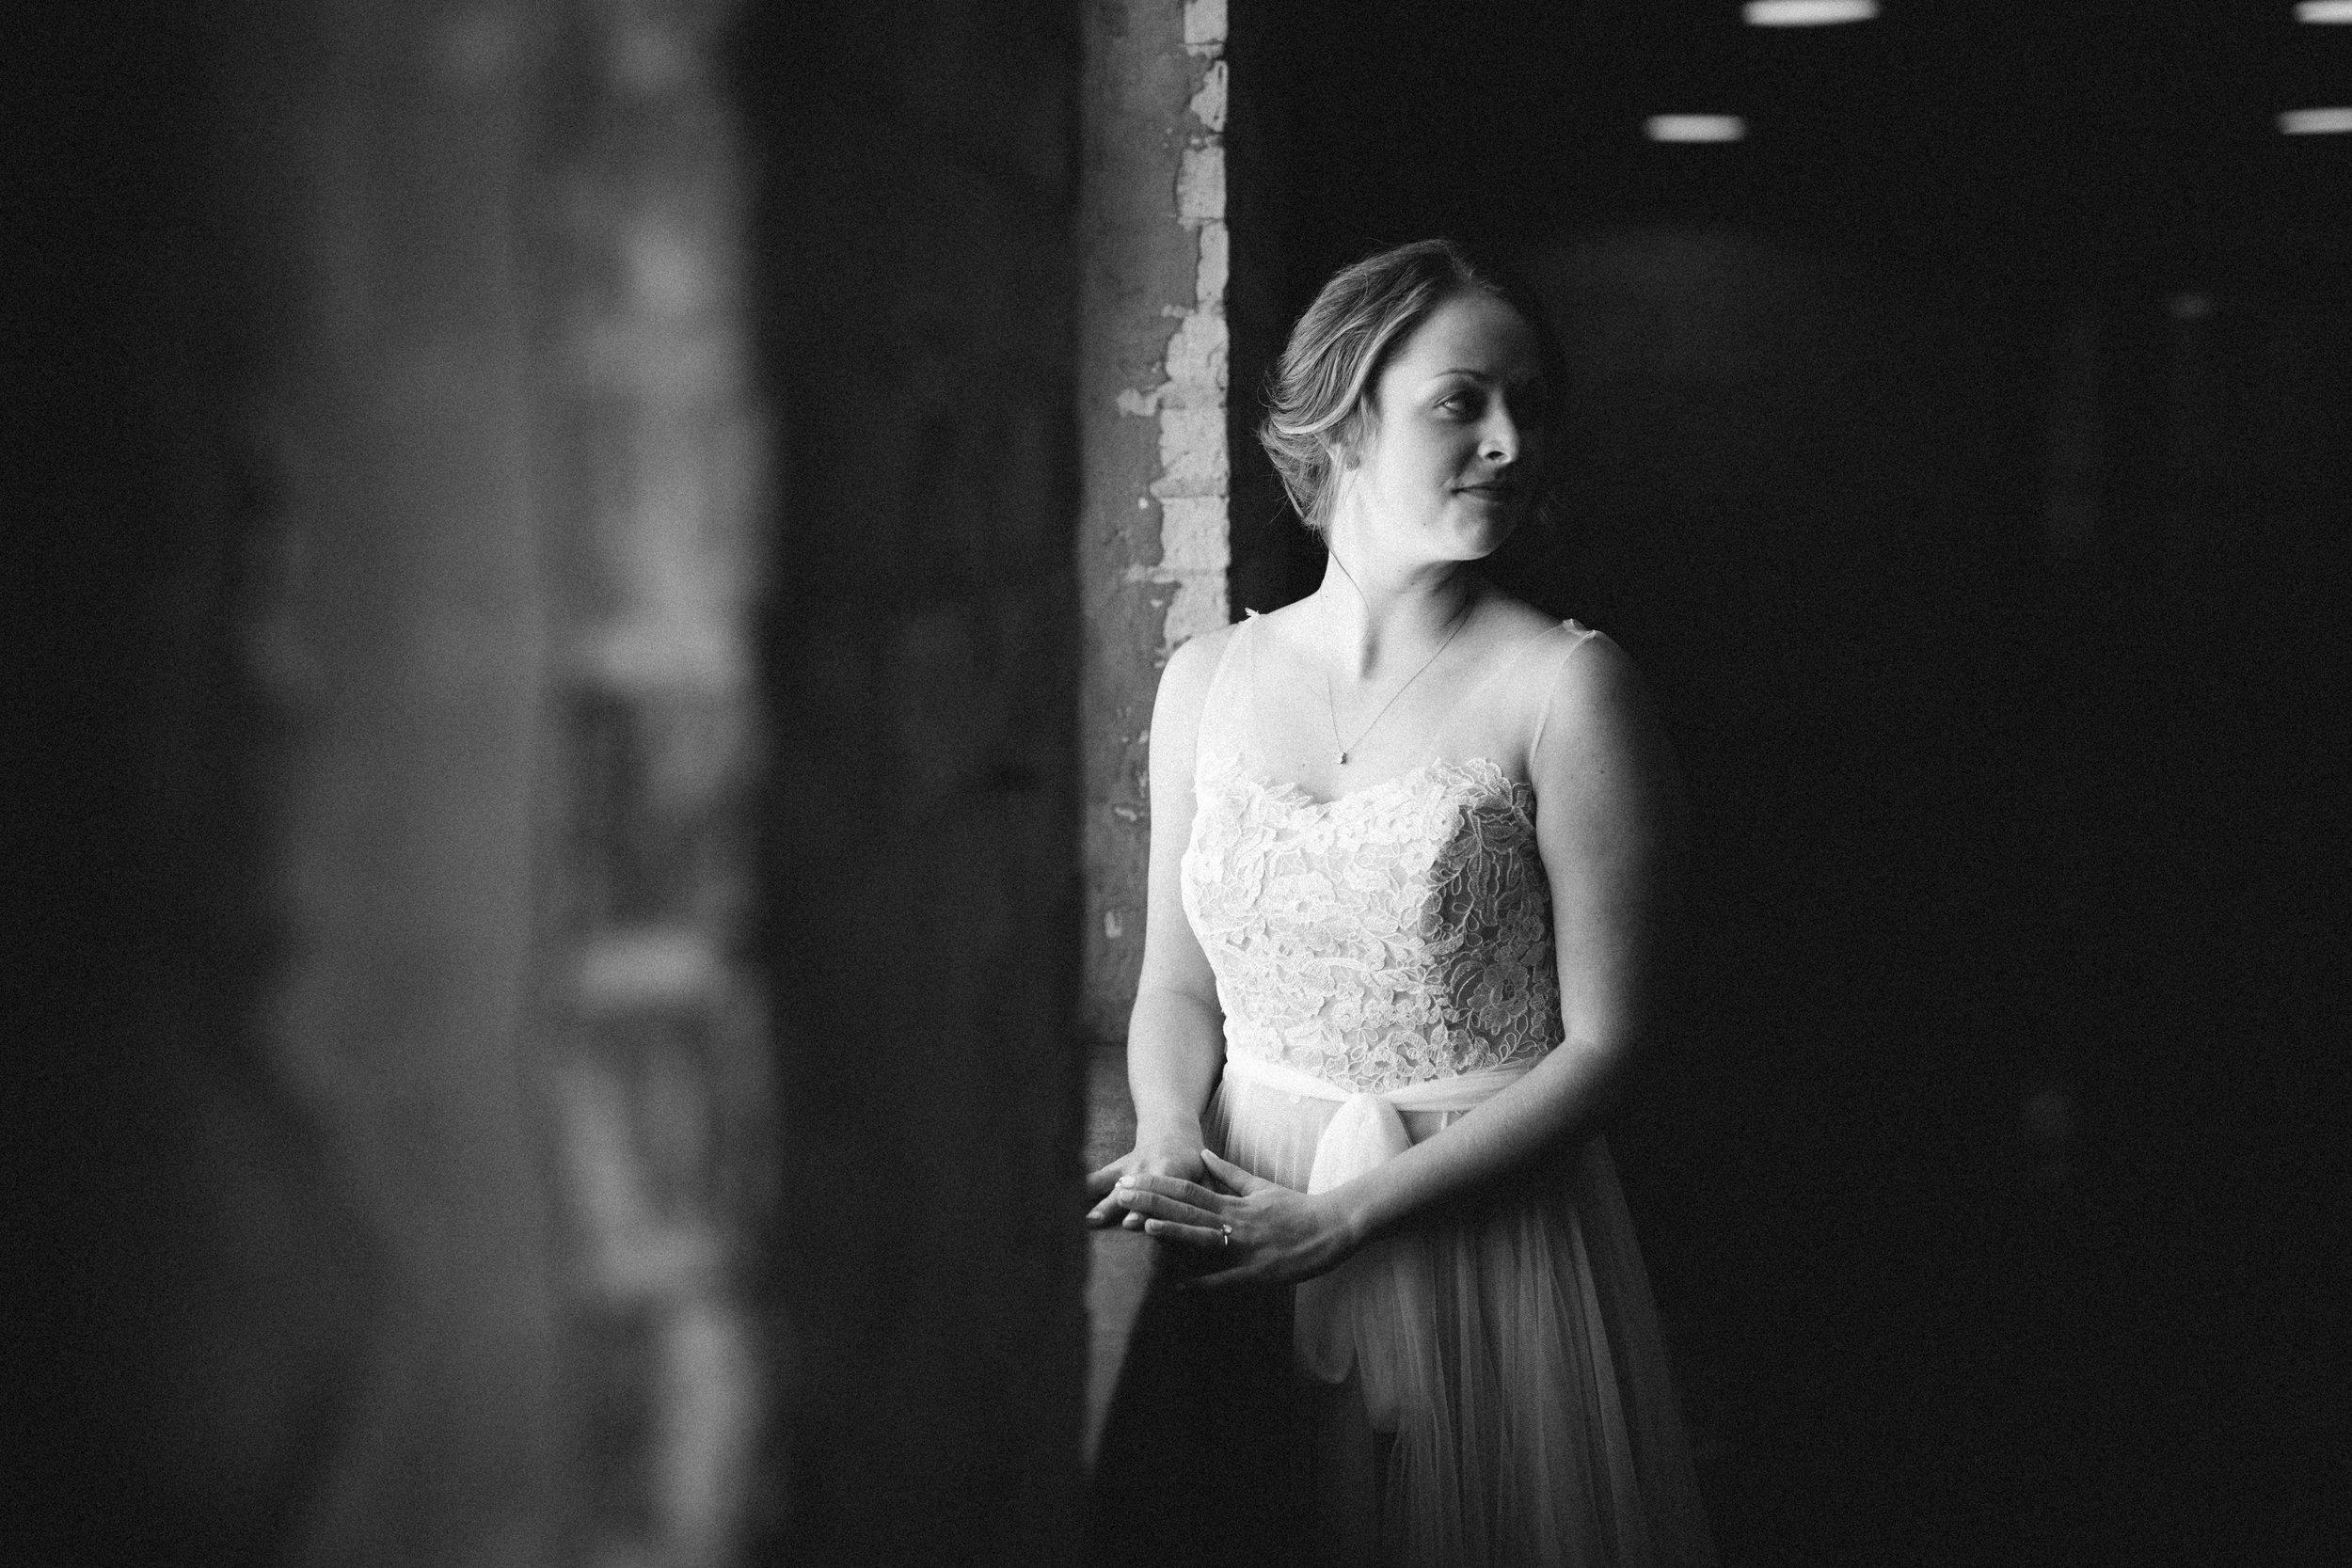 Bride-Wedding-Day-B&W-Photo-01